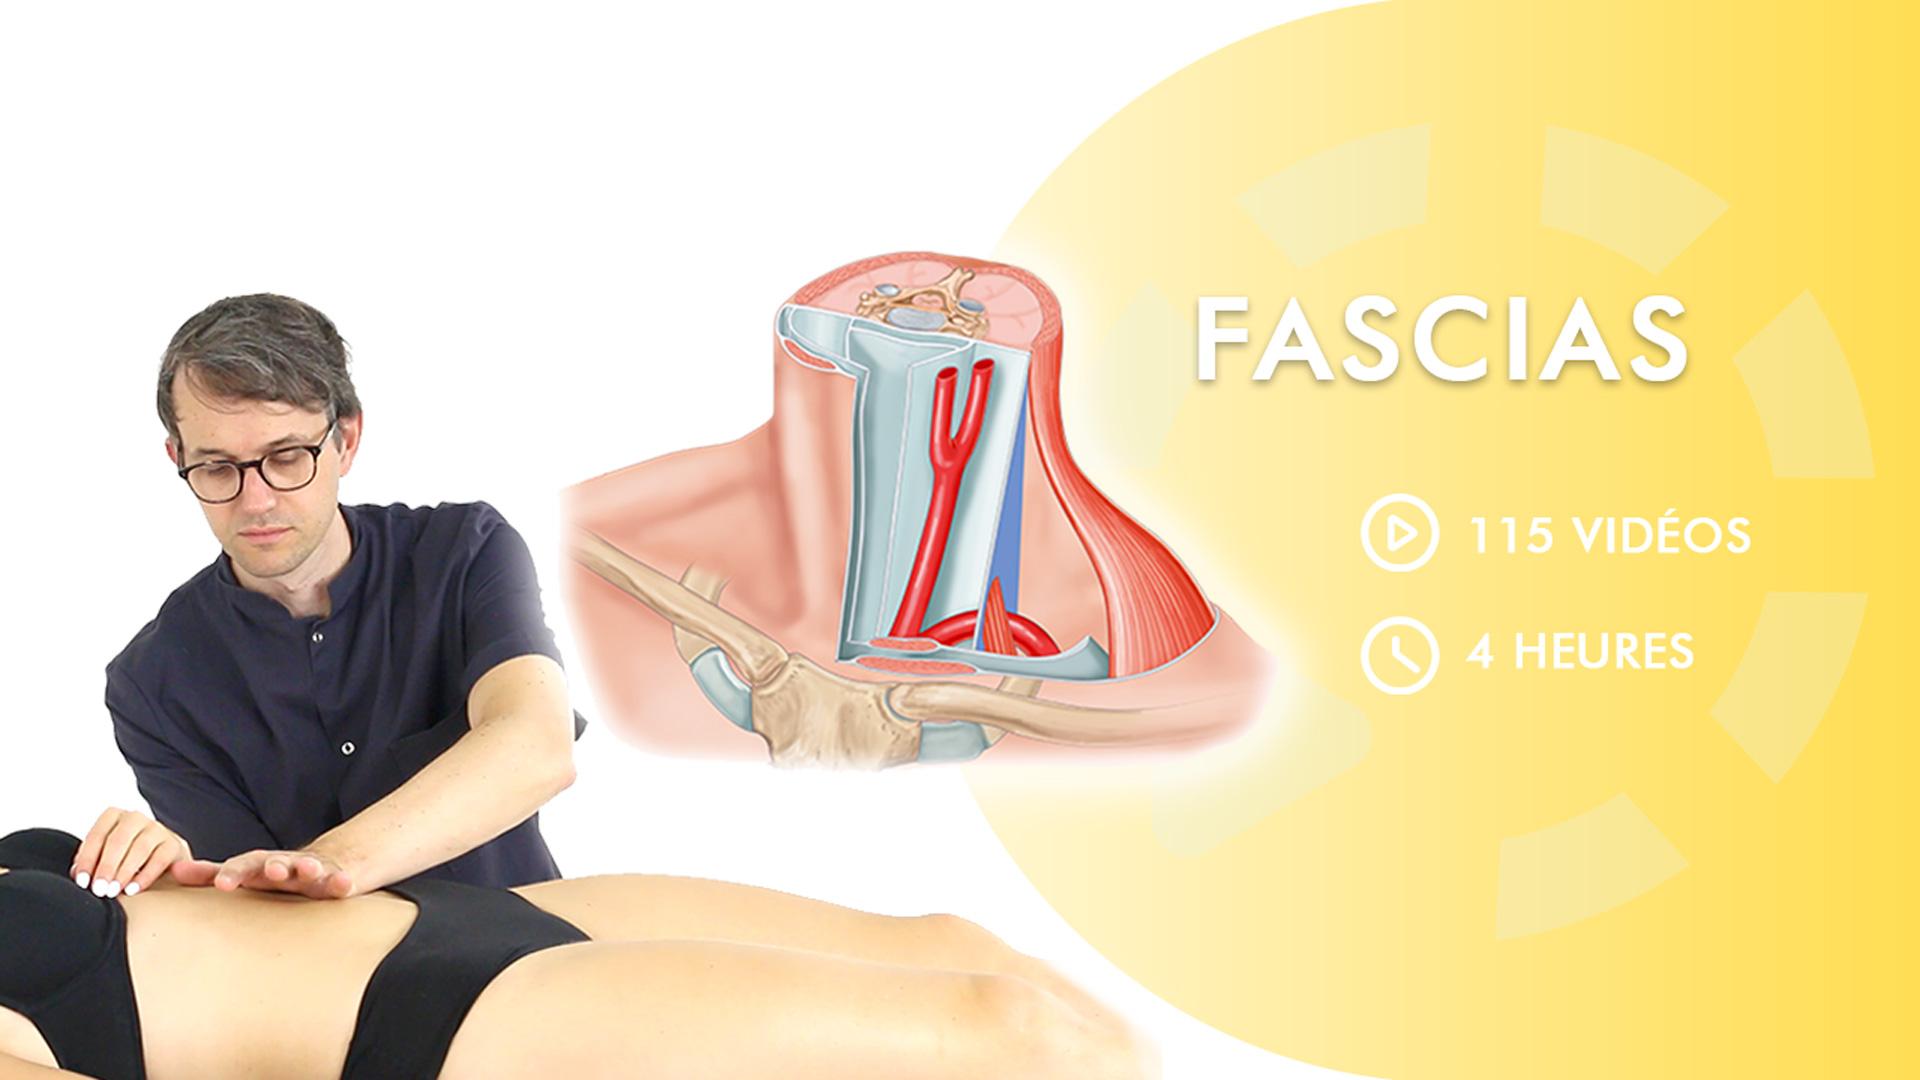 Fascias